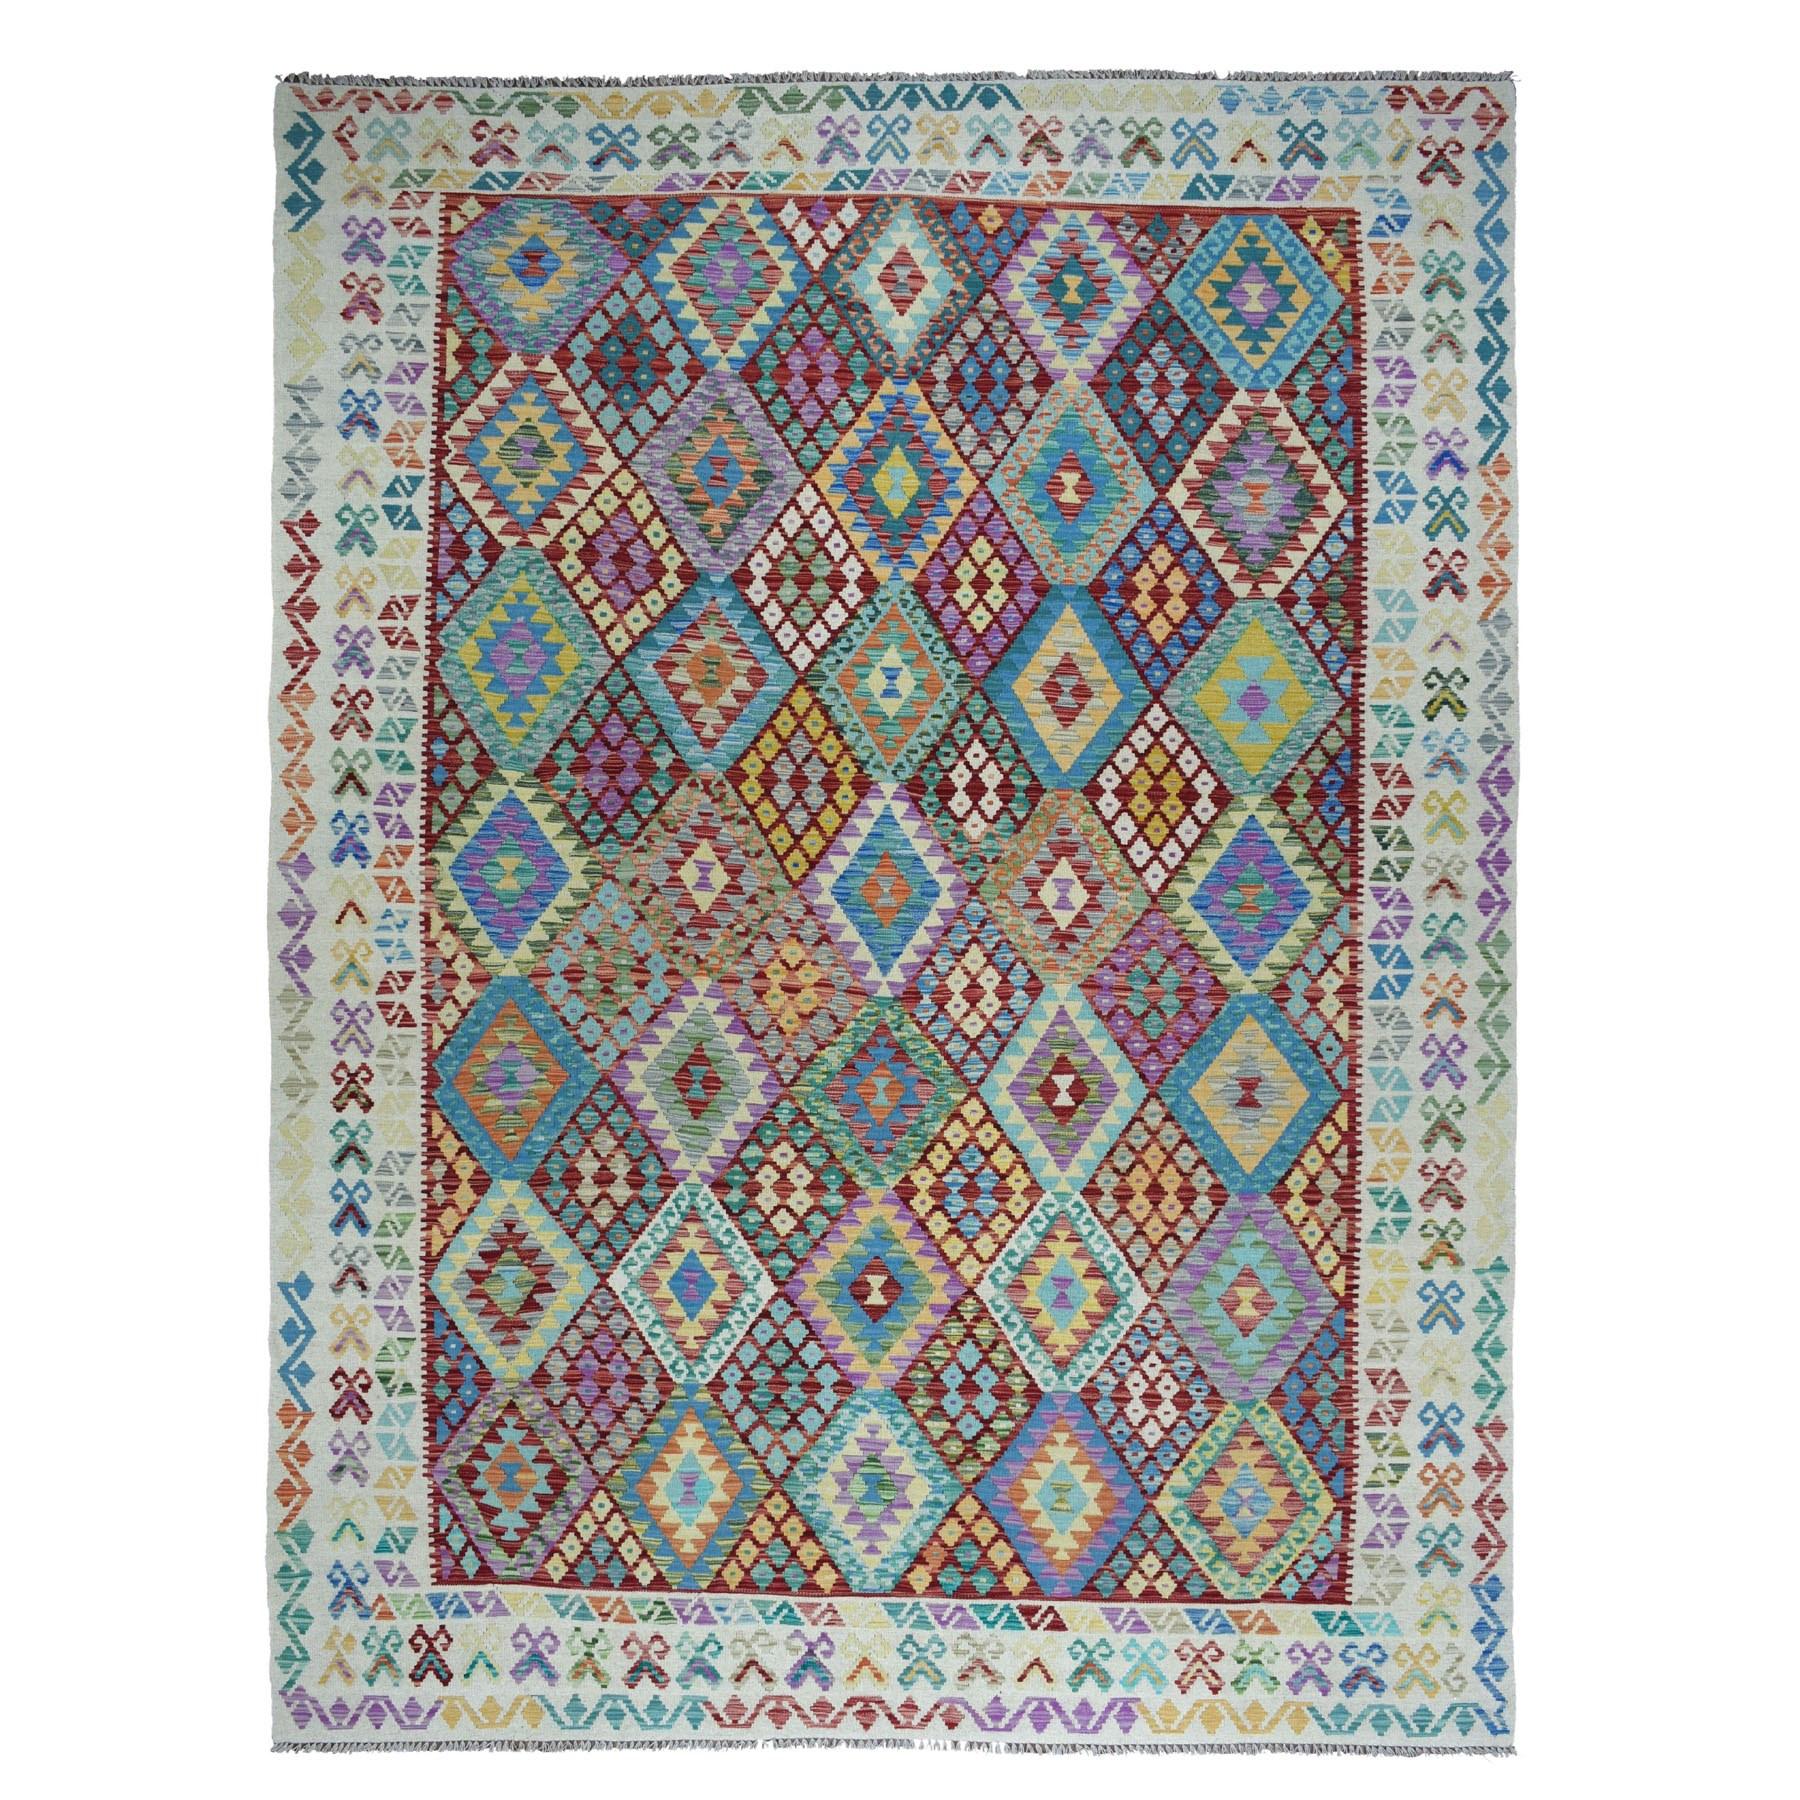 Flat Weave - Merchants Of Asia